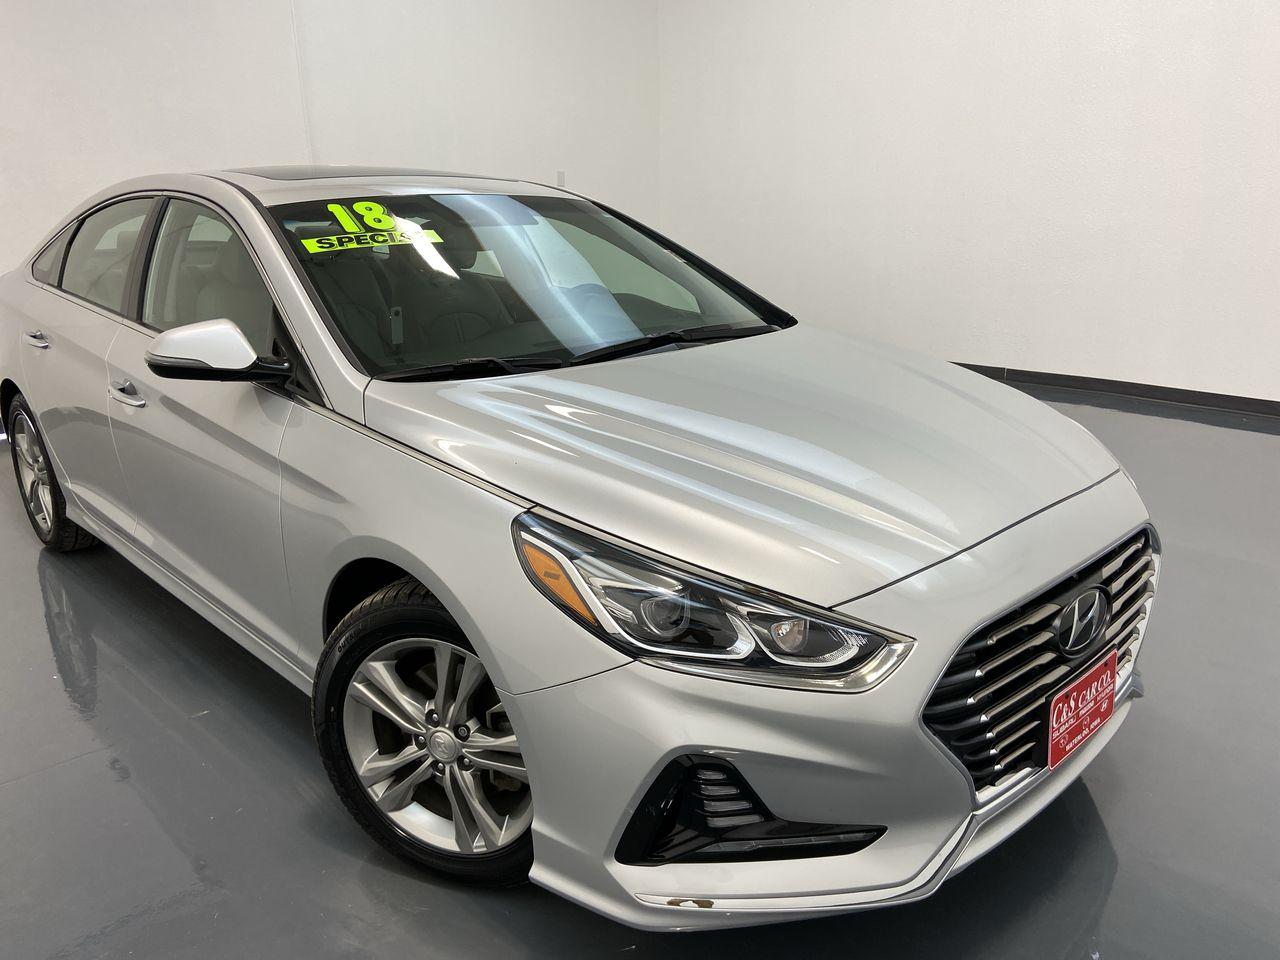 2018 Hyundai Sonata 4D Sedan 2.4  - HY8457A  - C & S Car Company